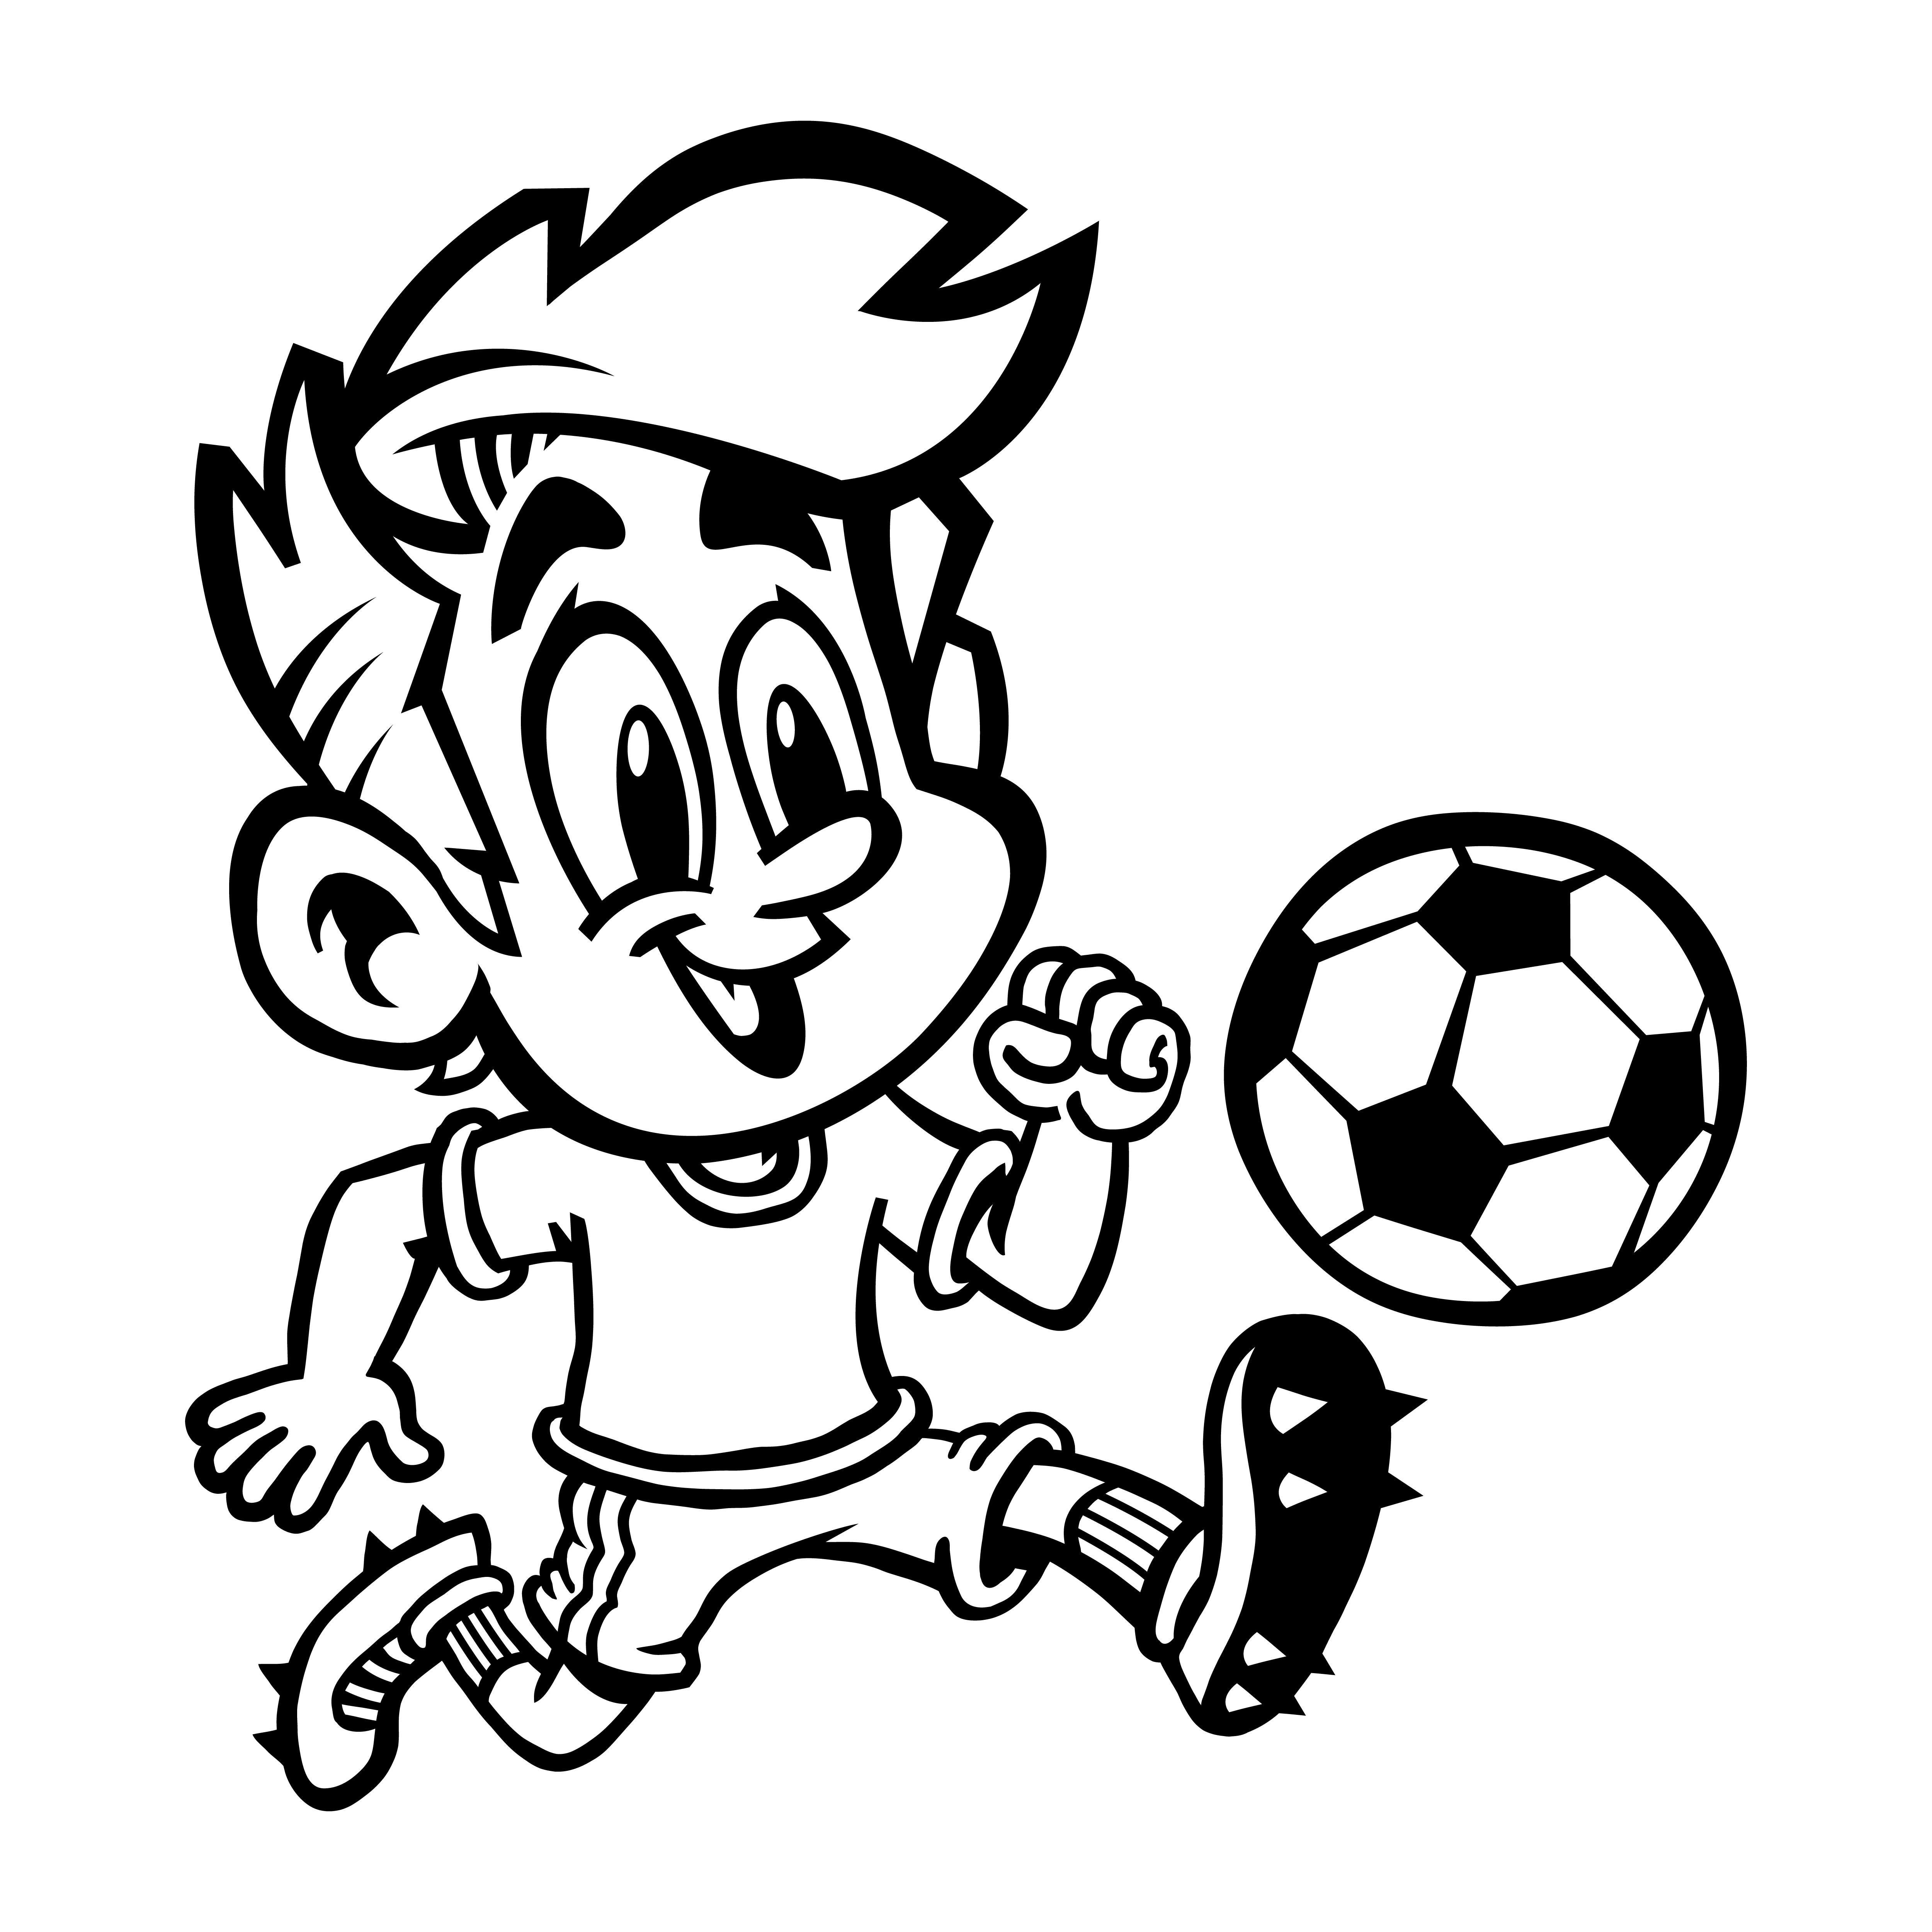 Dibujos De Futbol